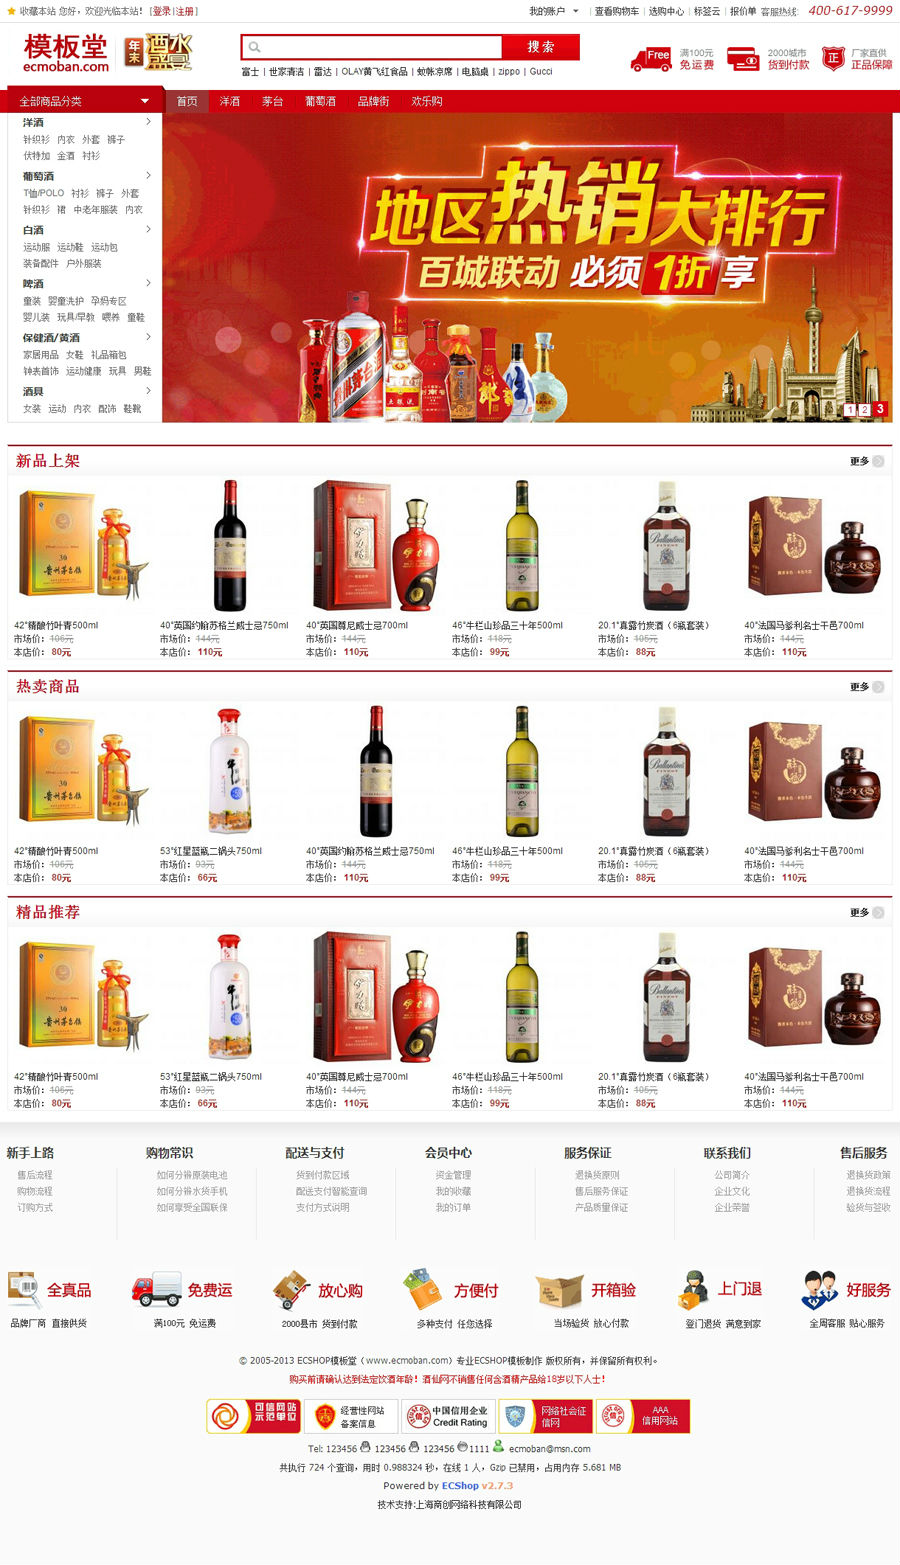 ECSHOP酒仙网2014商城模板简洁版